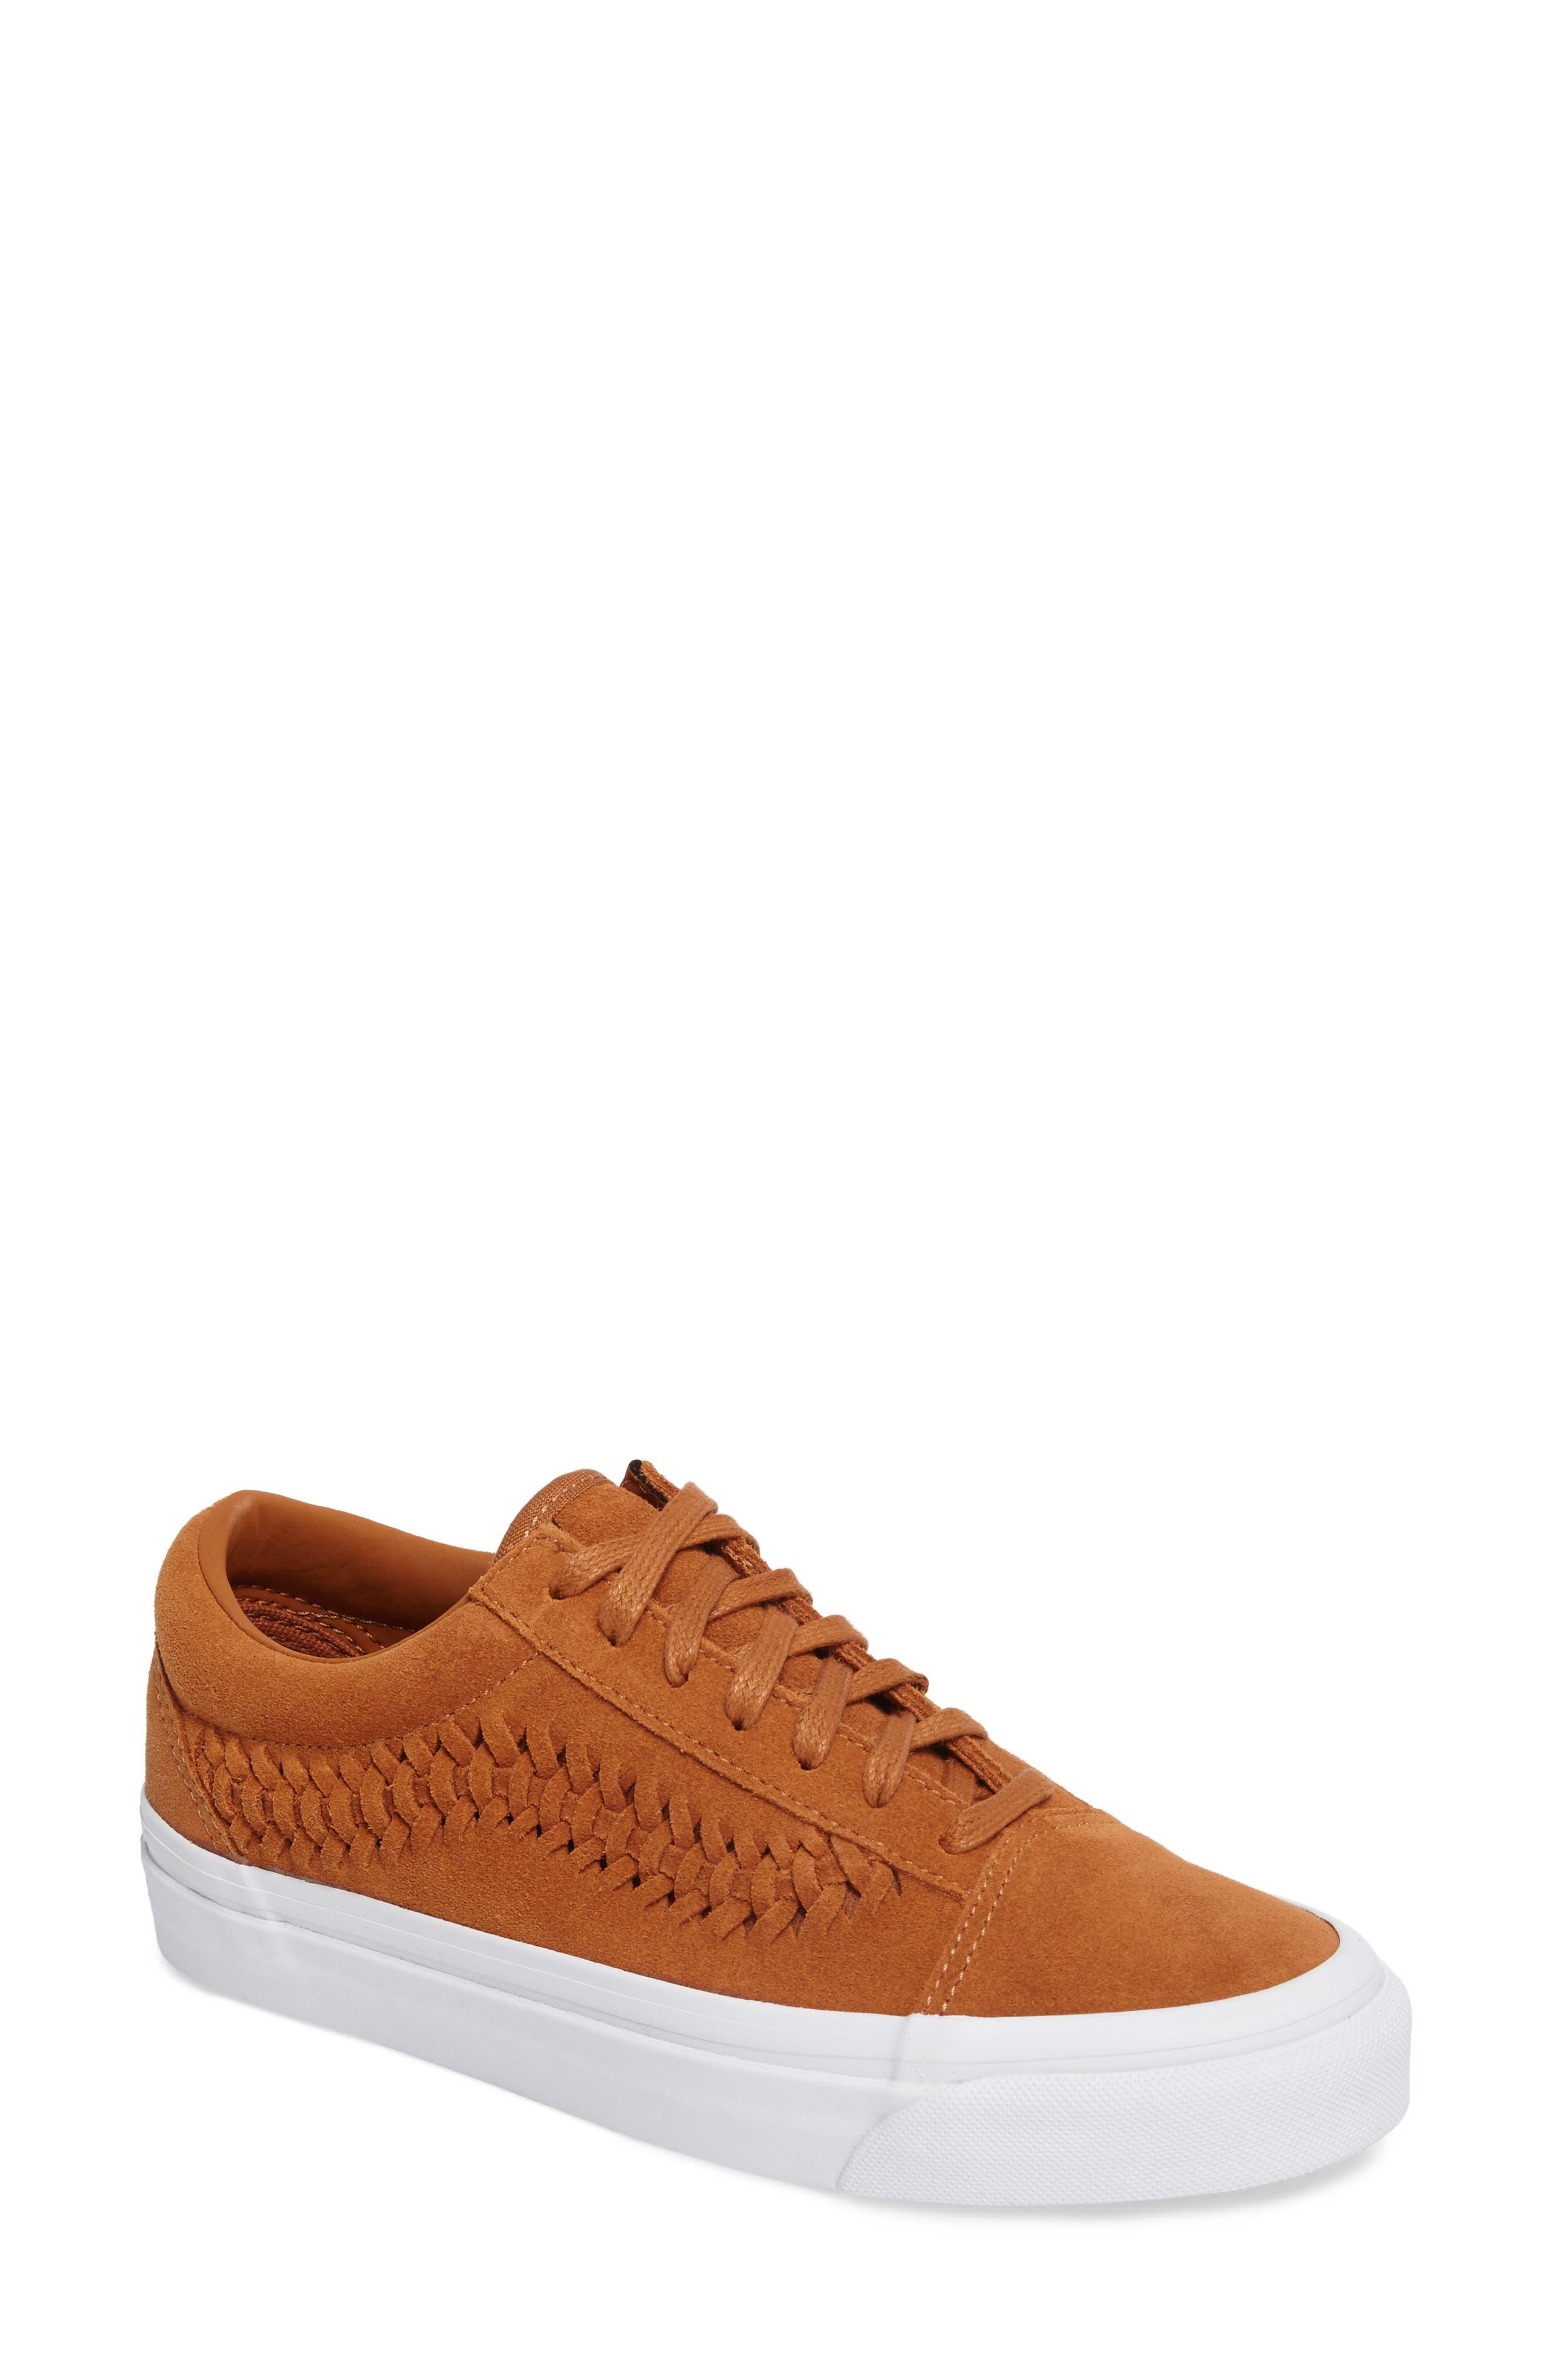 Old Skool Weave DX Sneaker,                             Main thumbnail 1, color,                             200